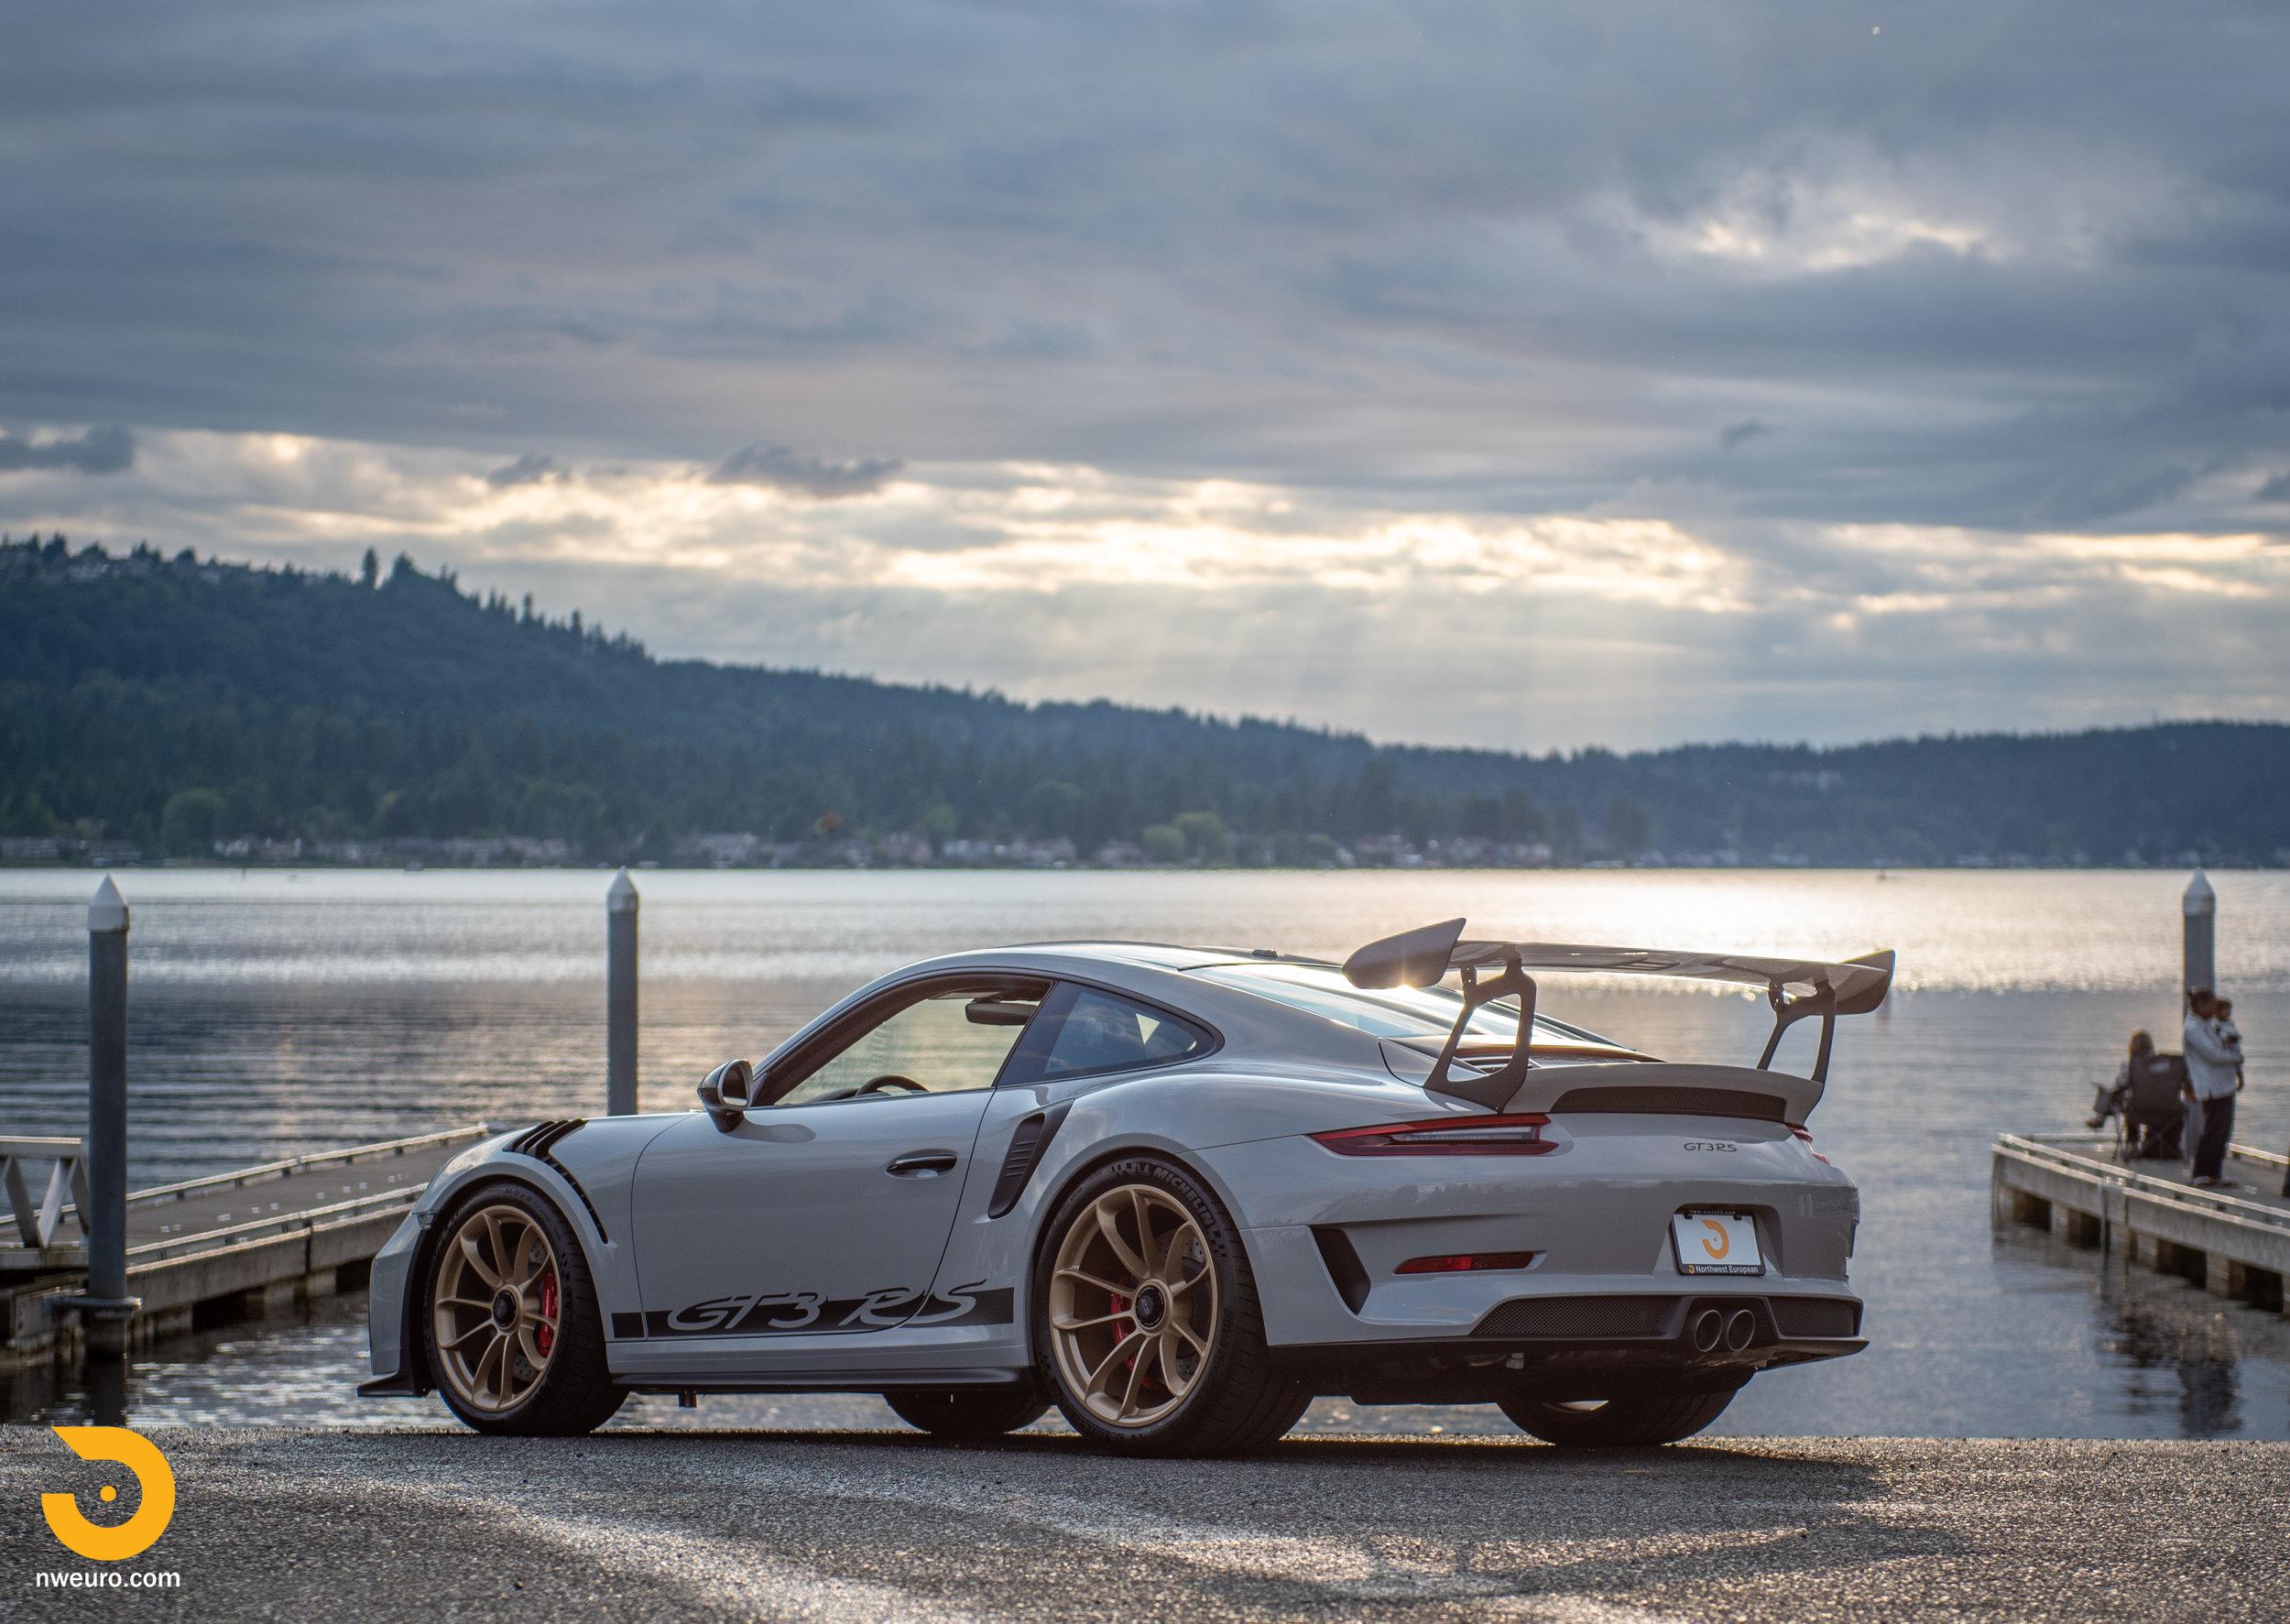 2019 Porsche GT3 RS - Chalk-81.jpg